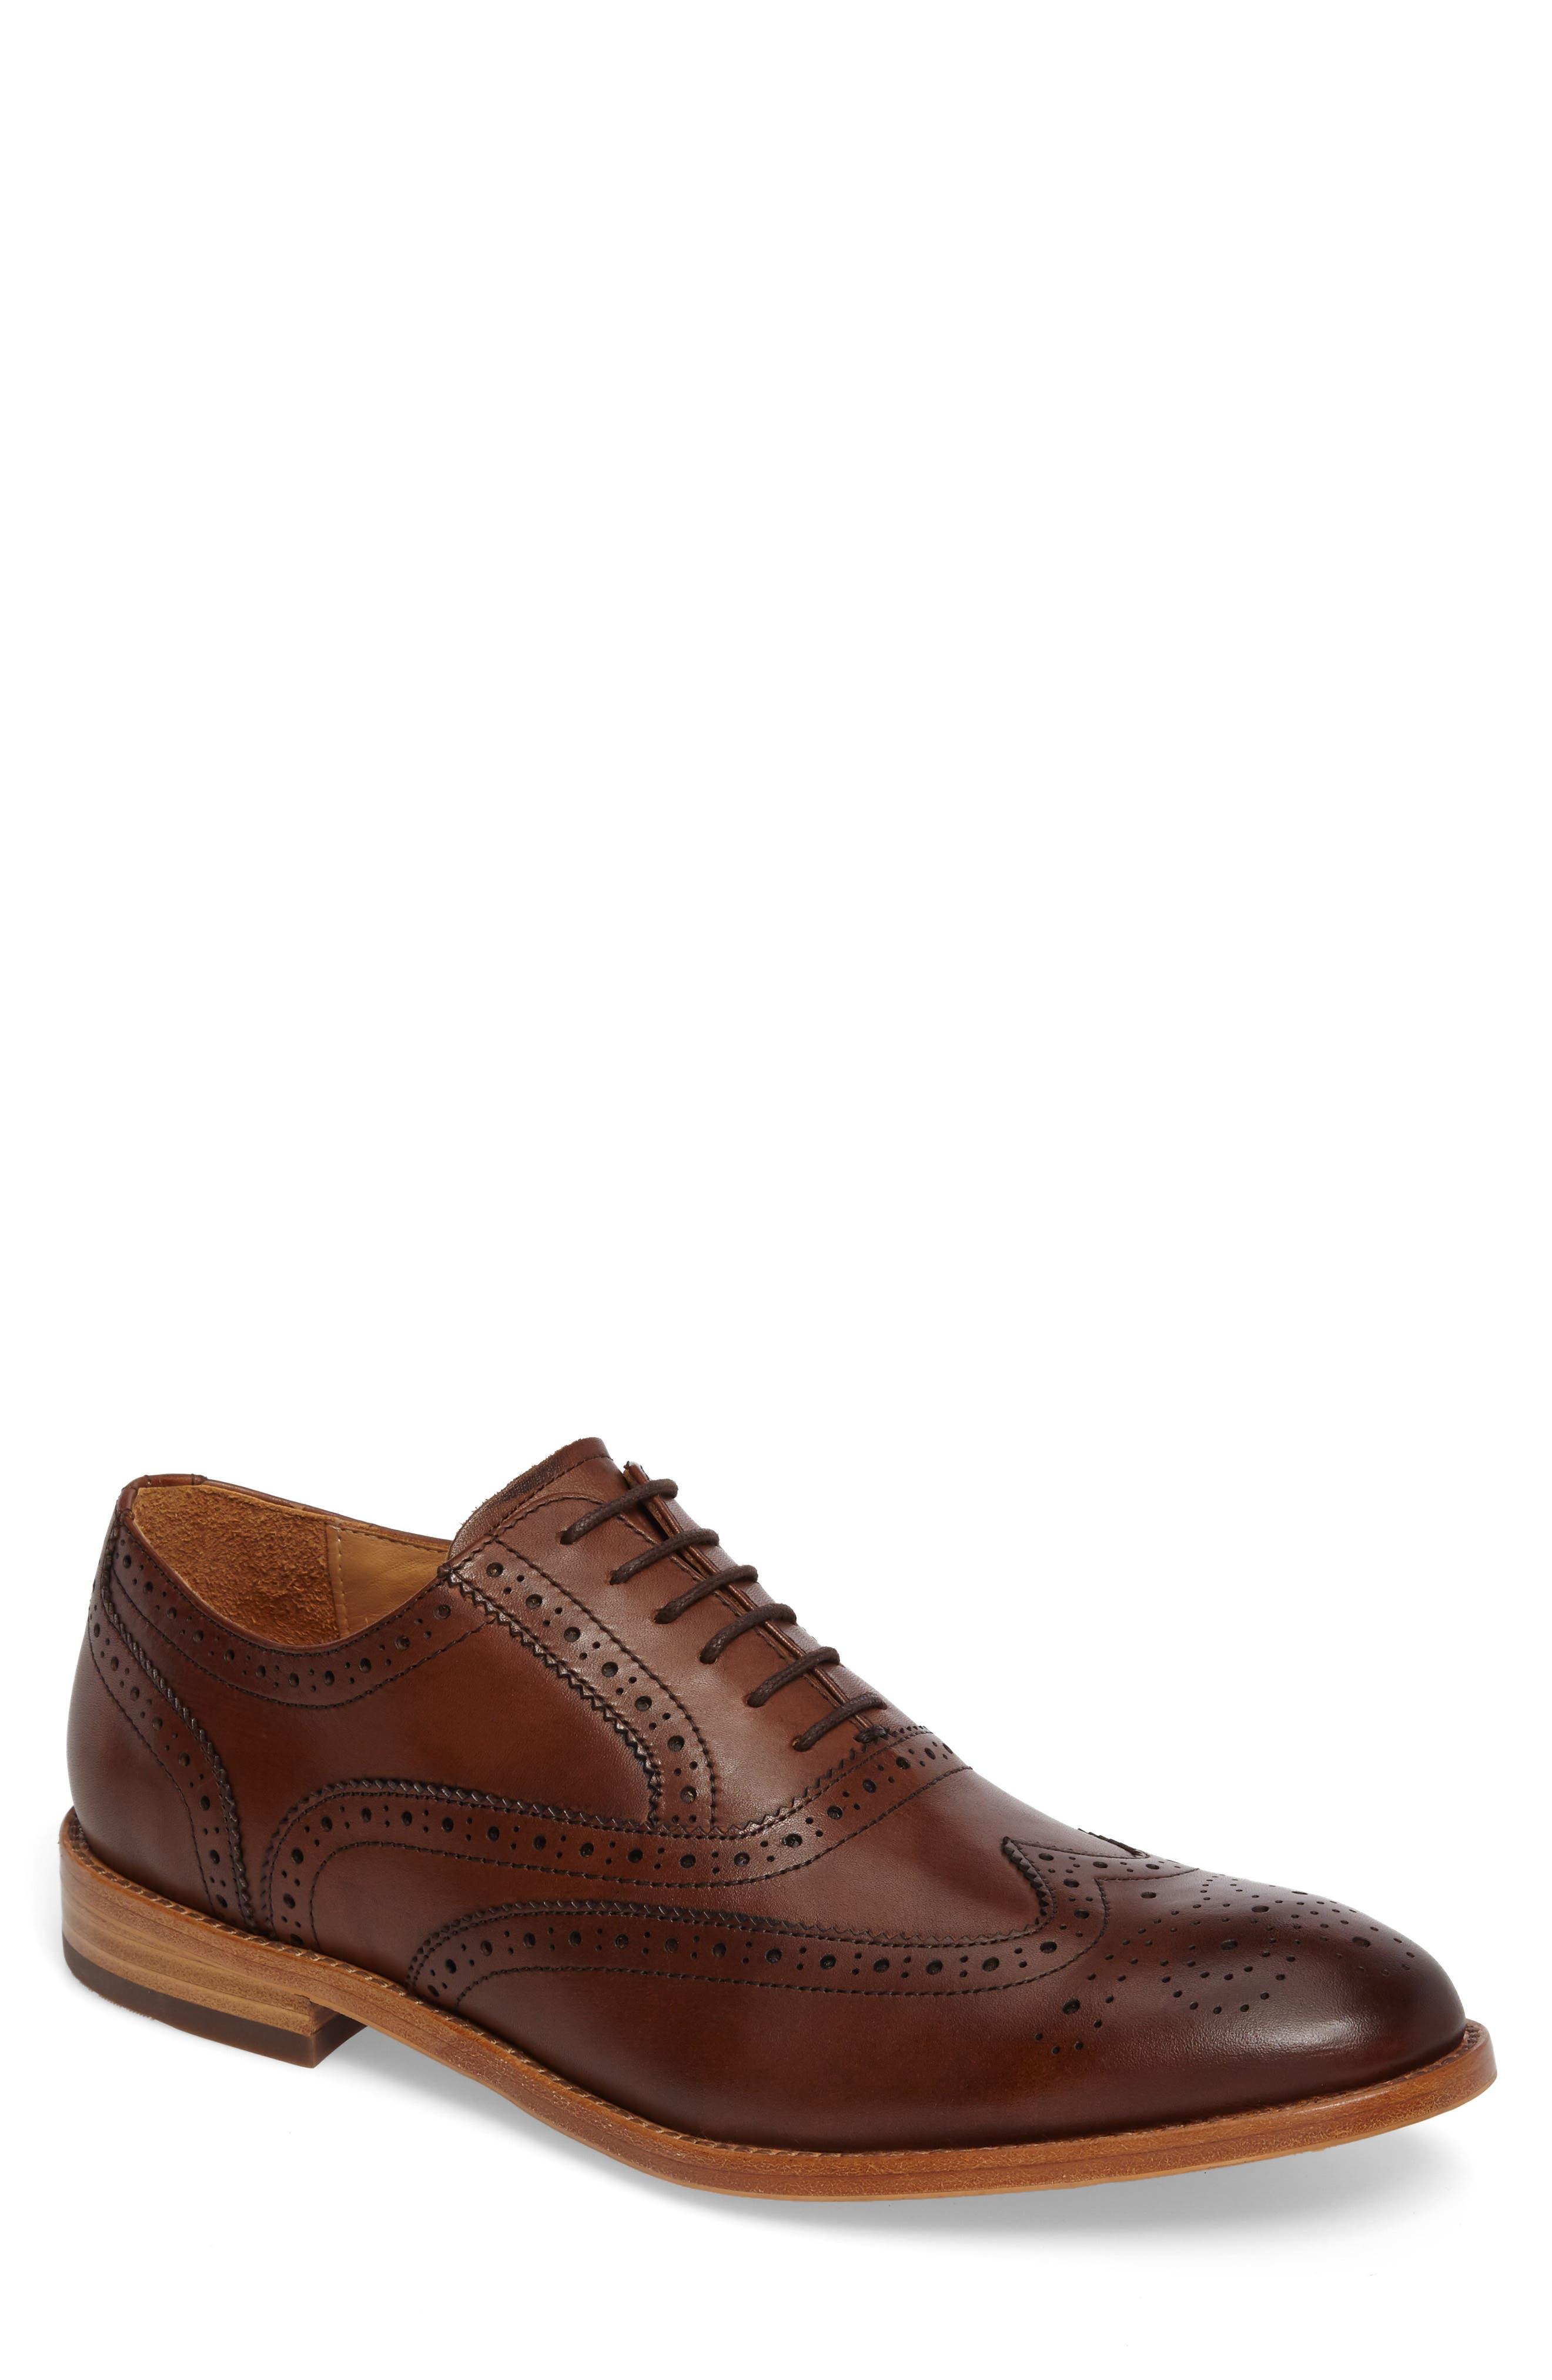 mens dress shoes size 14 eee style guru fashion glitz